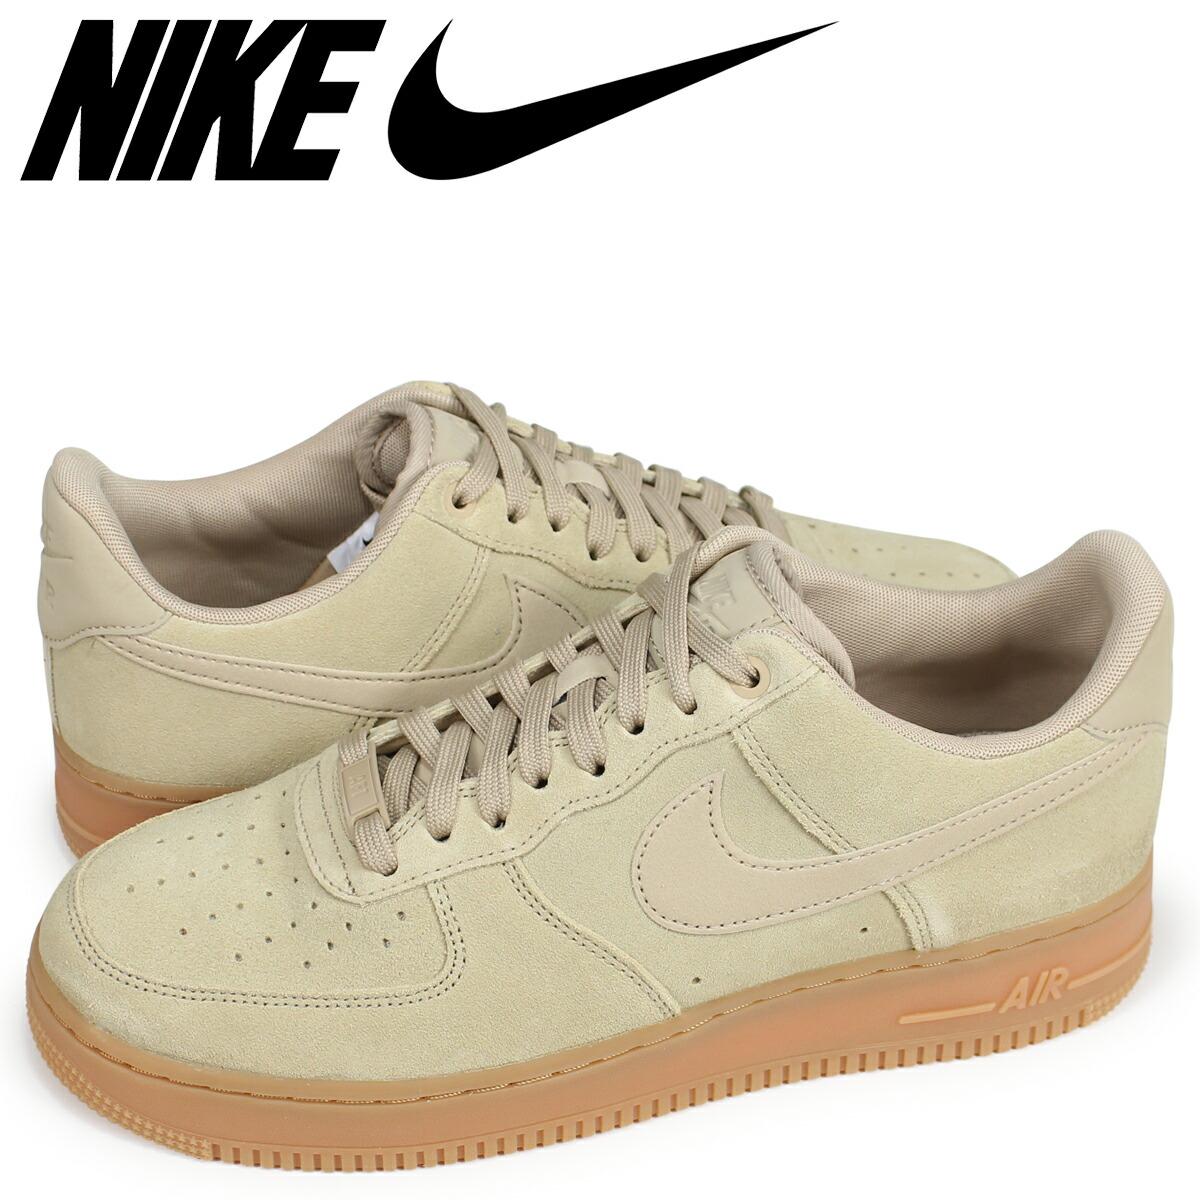 SneaK Online Shop  Nike NIKE air force 1 sneakers men AIR FORCE 1 07 ... 8d3f9bfd2